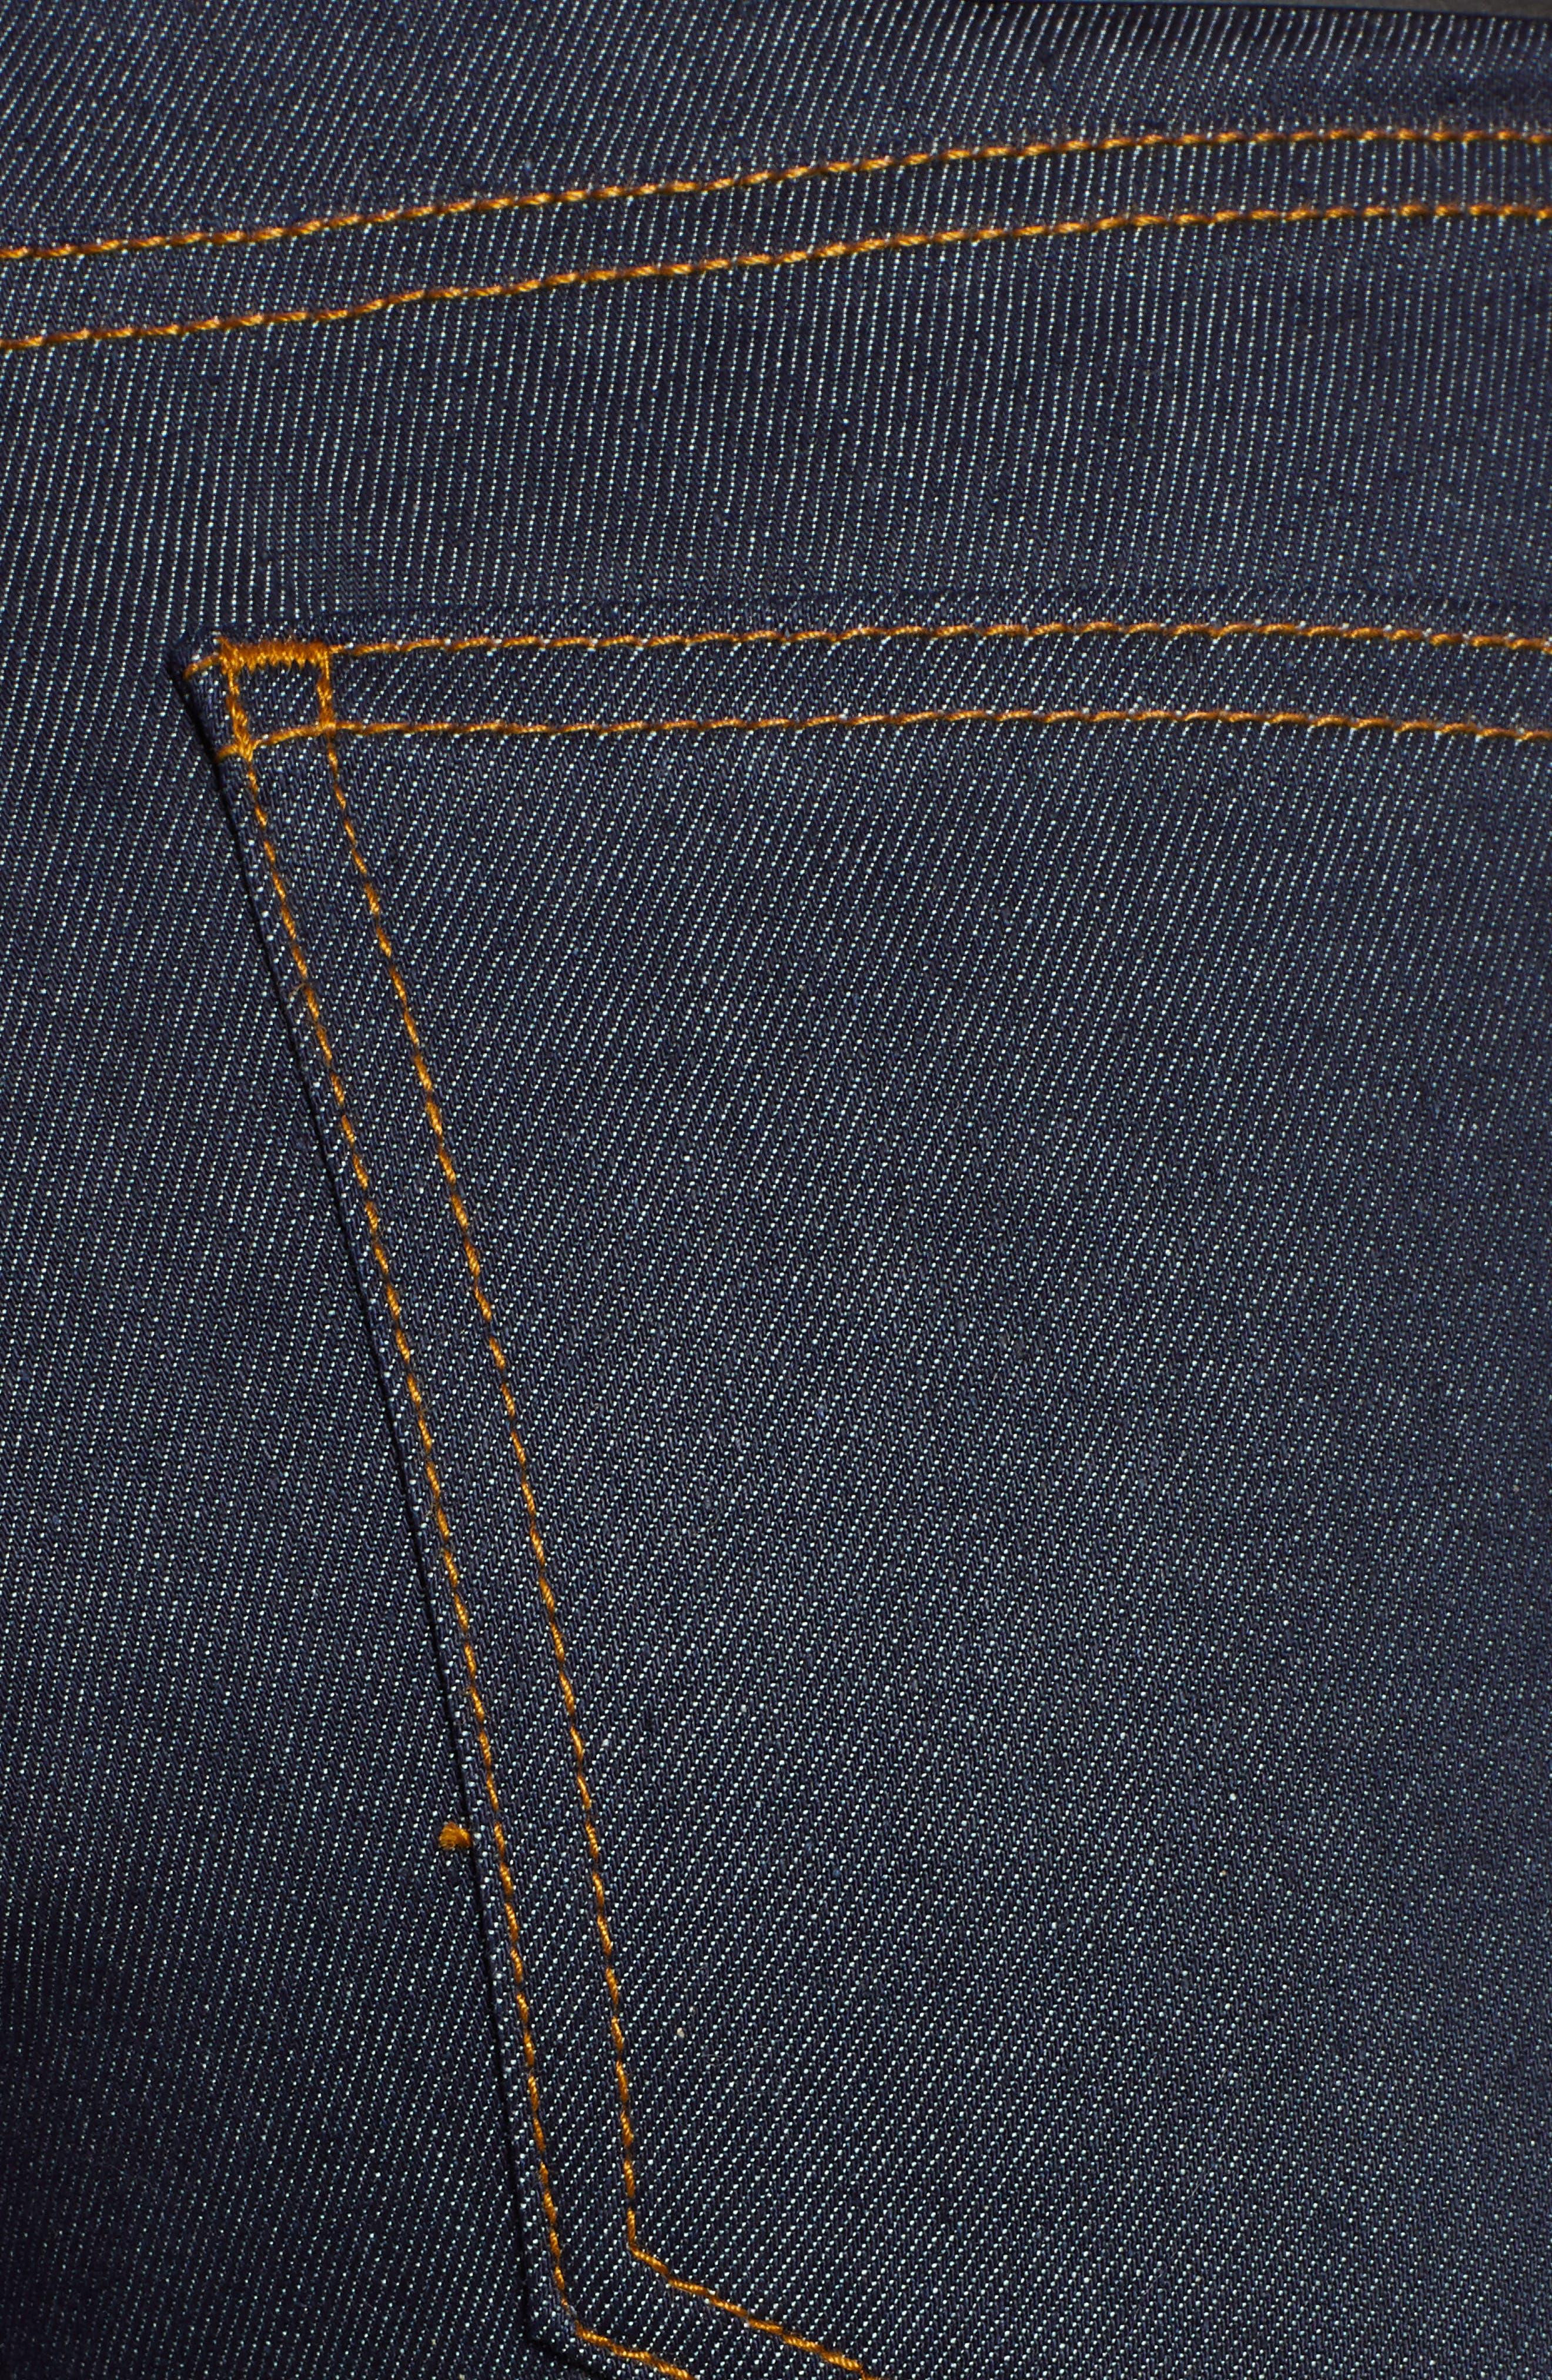 Edie High Waist Crop Jeans,                             Alternate thumbnail 6, color,                             RINSED BLUE